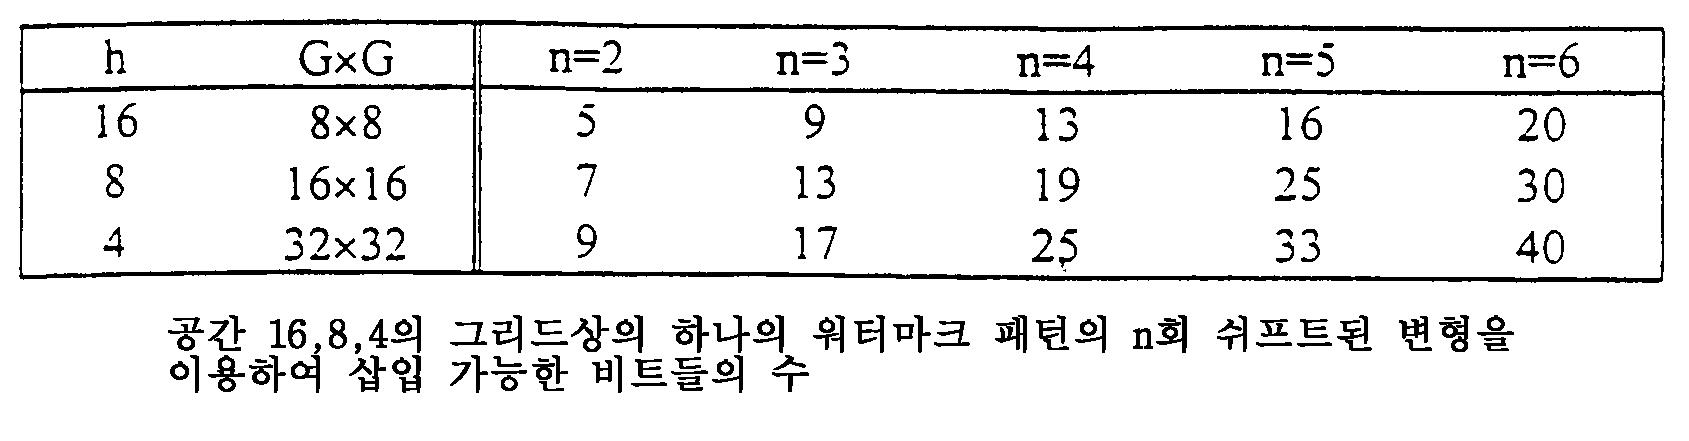 Figure 111999014177864-pct00016